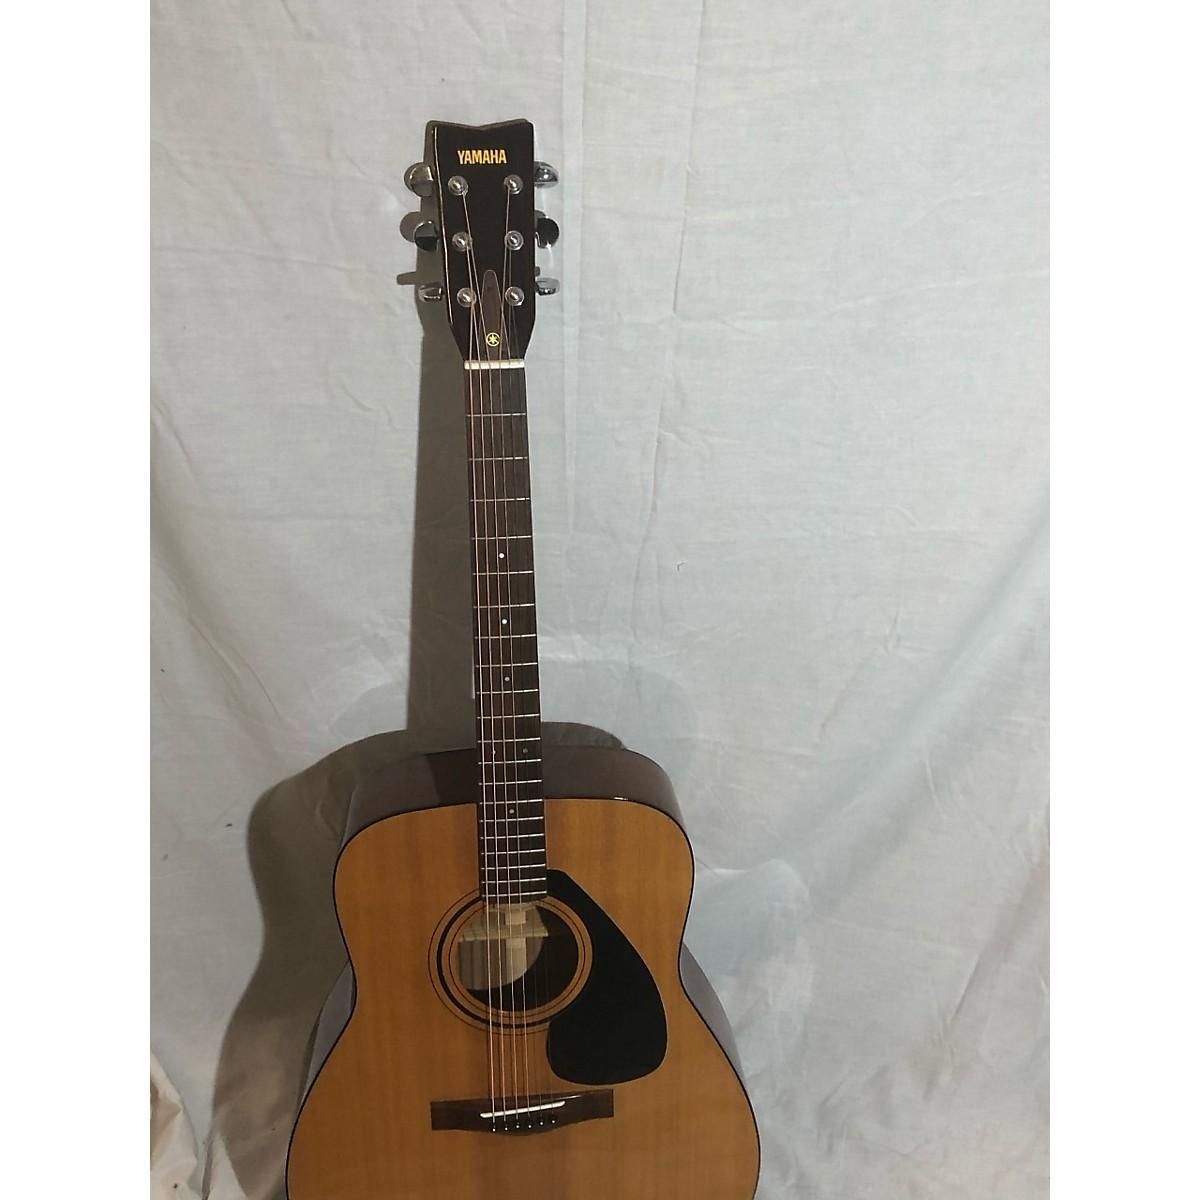 Yamaha 1980s FG-750s Acoustic Guitar